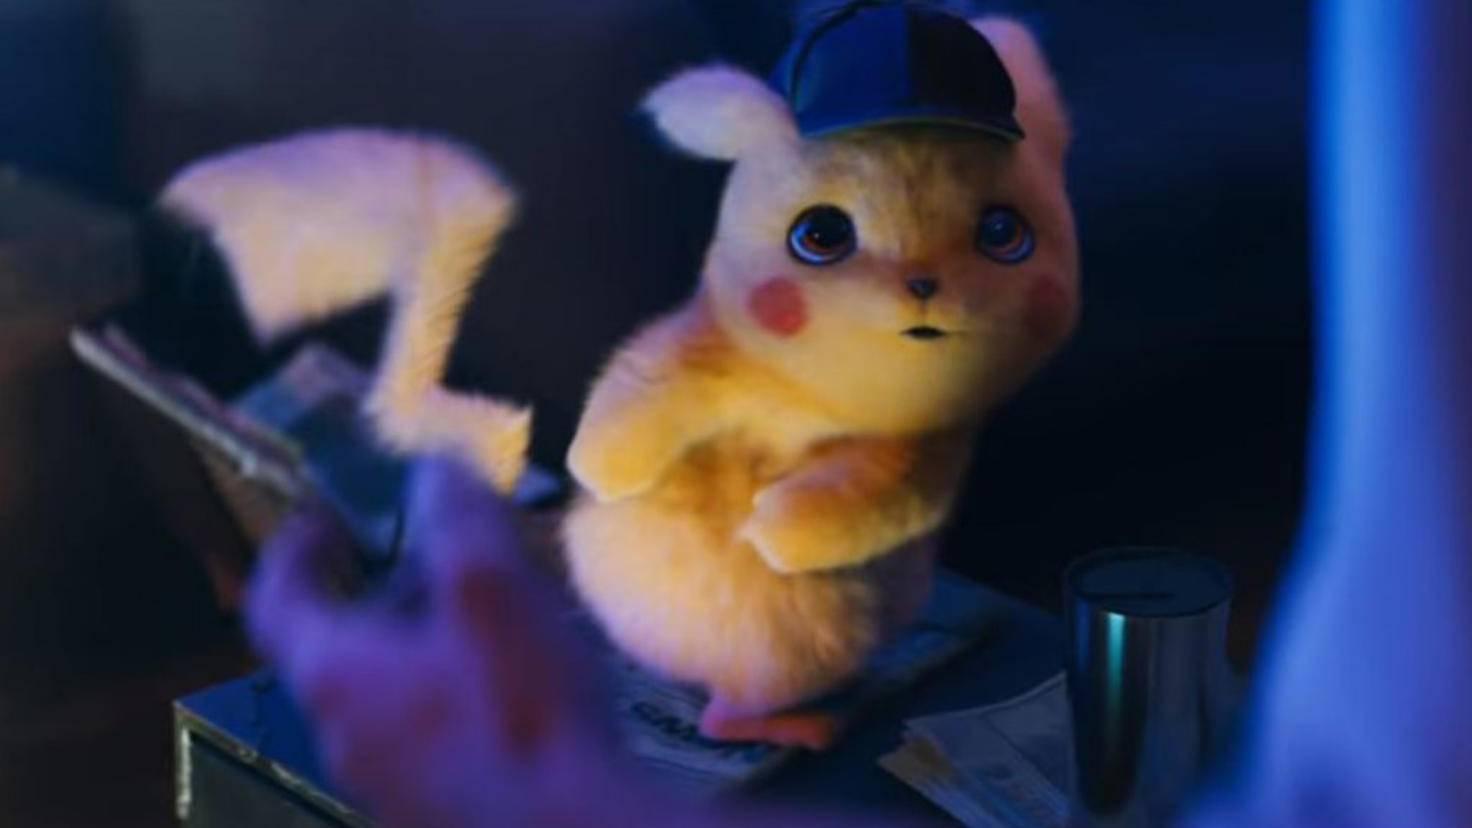 Pikachu in Pokémon Detective Pikachu